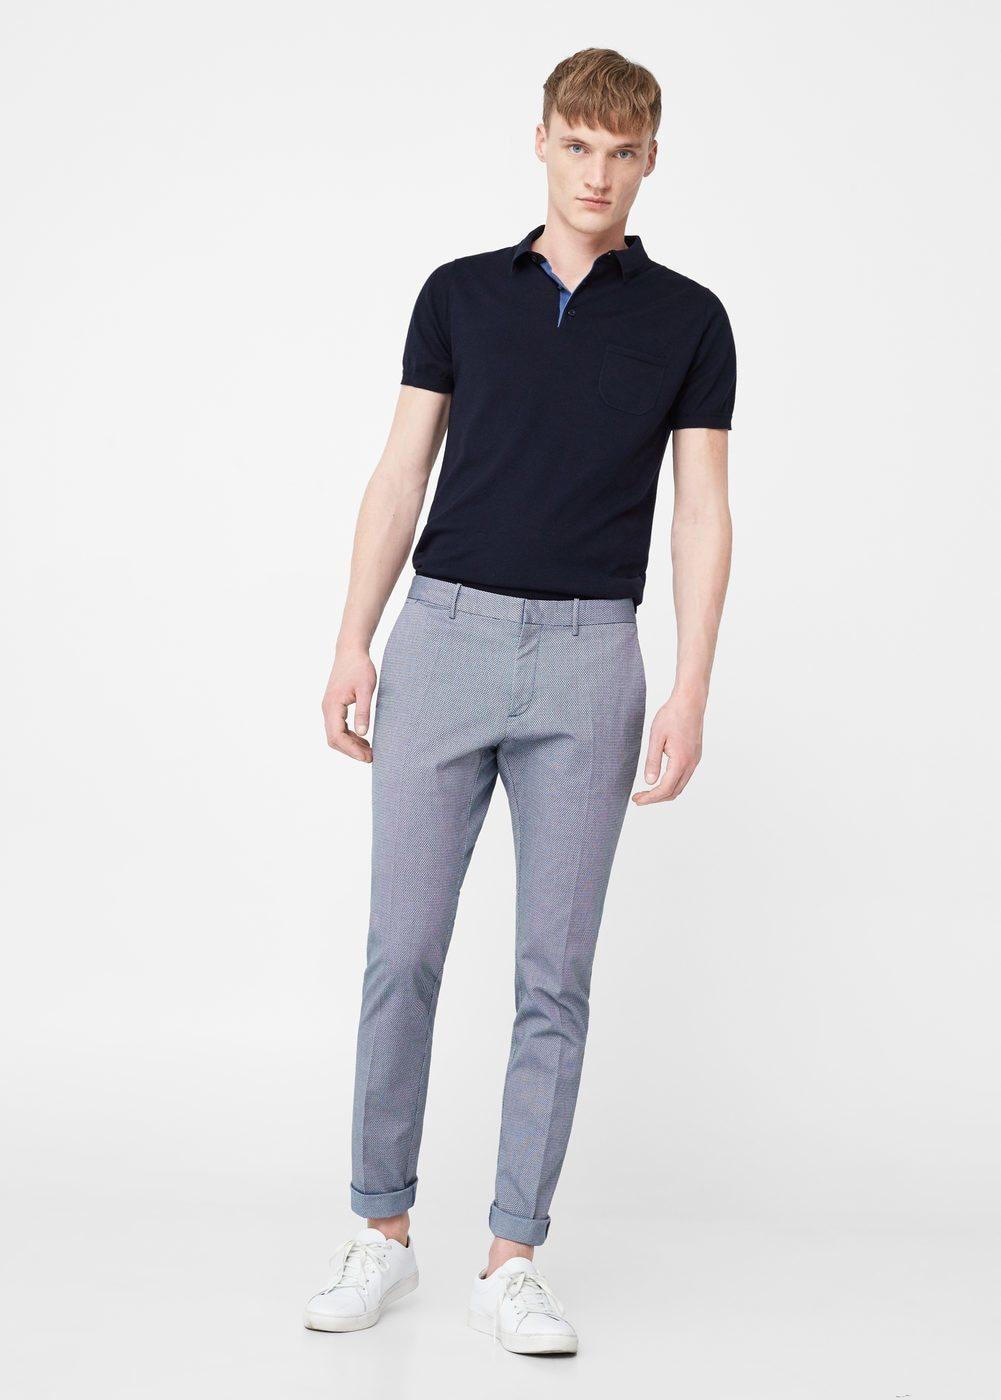 f6a71942158c9 Cómo combinar un pantalón de vestir celeste (35 looks de moda ...